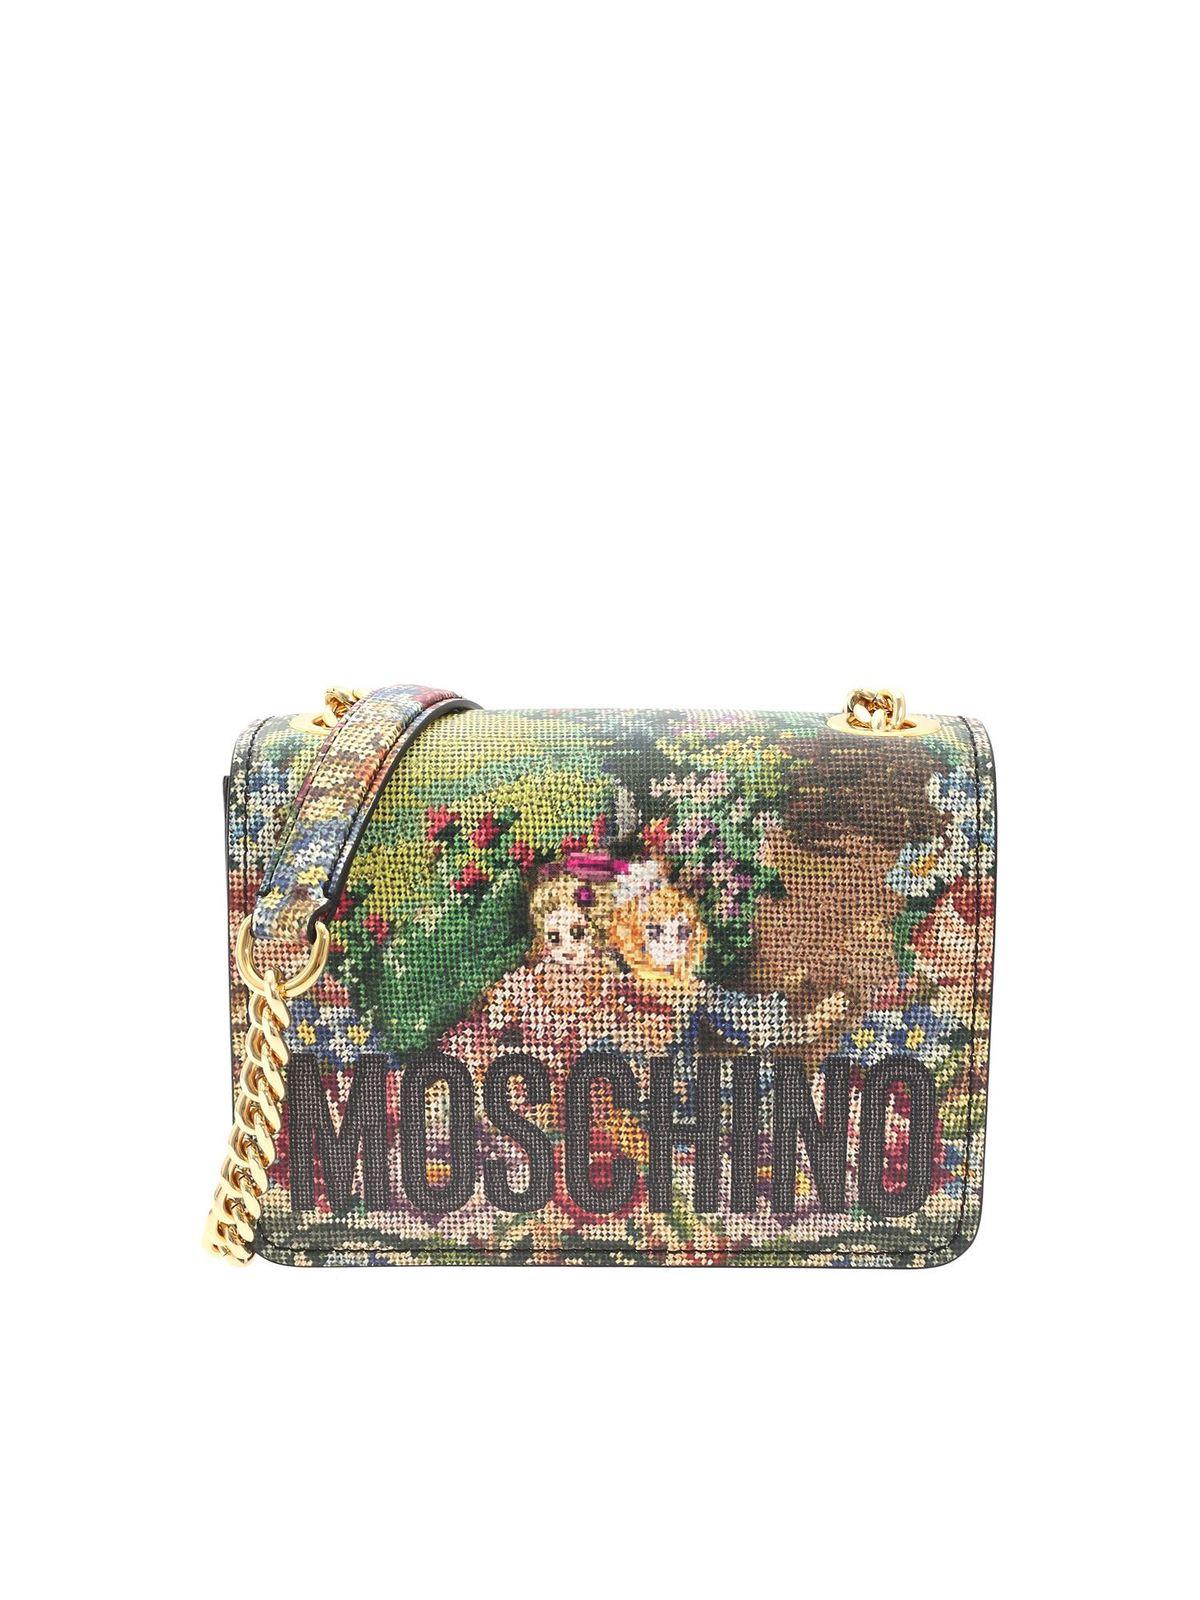 Moschino CROSS STITCH ANIME MULTICOLOR BAG